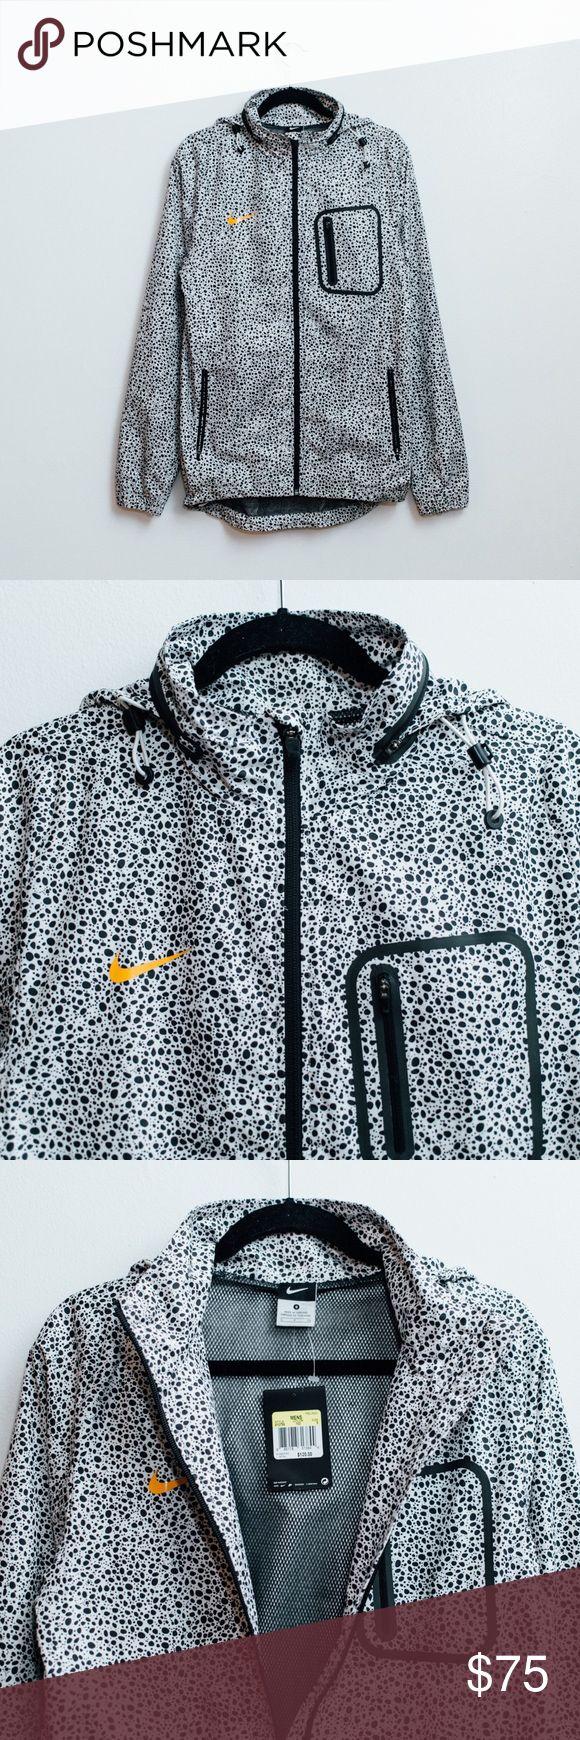 BNWT MENS NIKE MERCURIAL SAFARI JACKET Brand new with tags Nike Mercurial Safari jacket. White with black safari print and an orange swoosh. Offers considered, please no trades. Nike Jackets & Coats Windbreakers